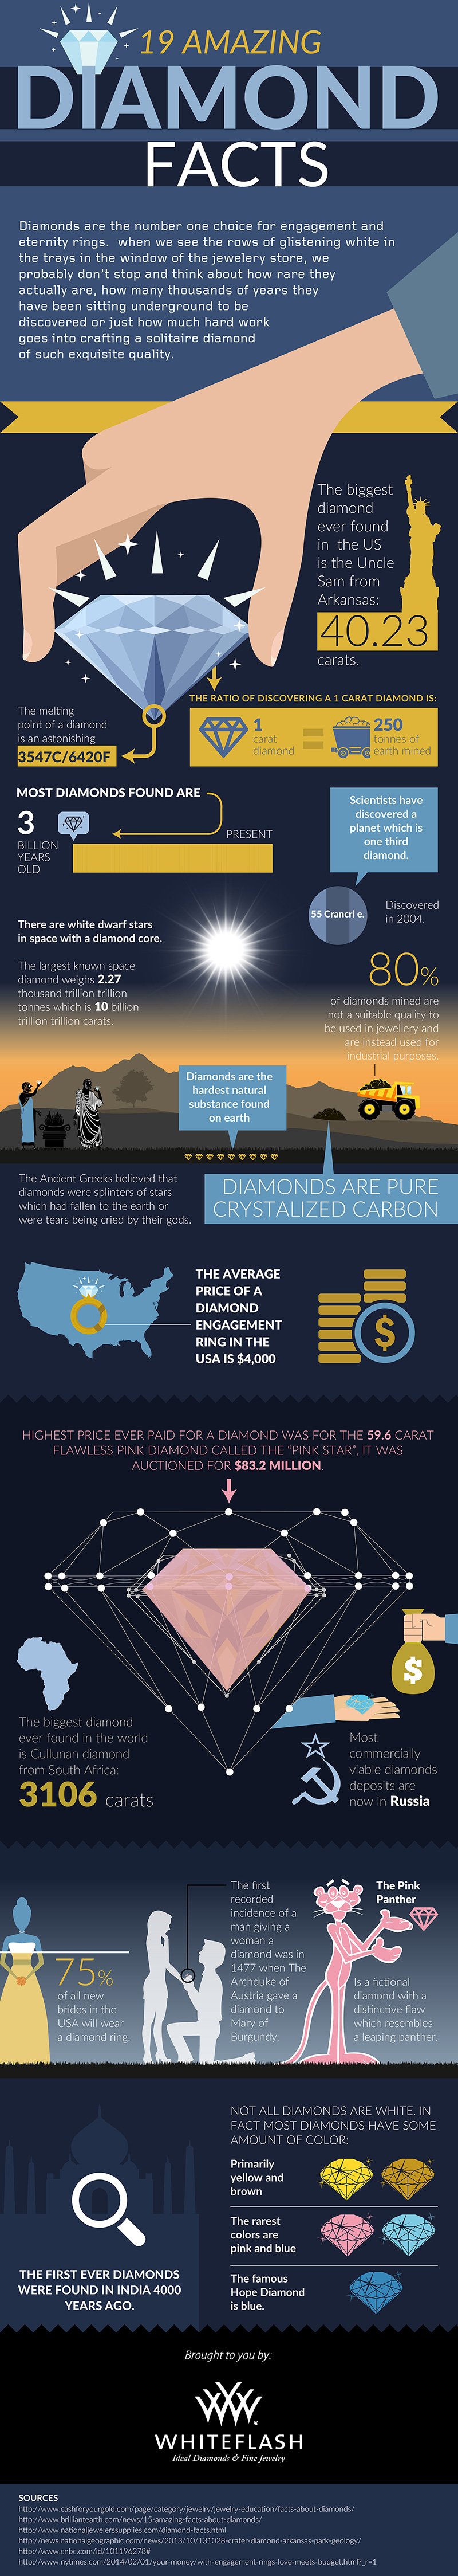 19 Amazing Diamond Facts